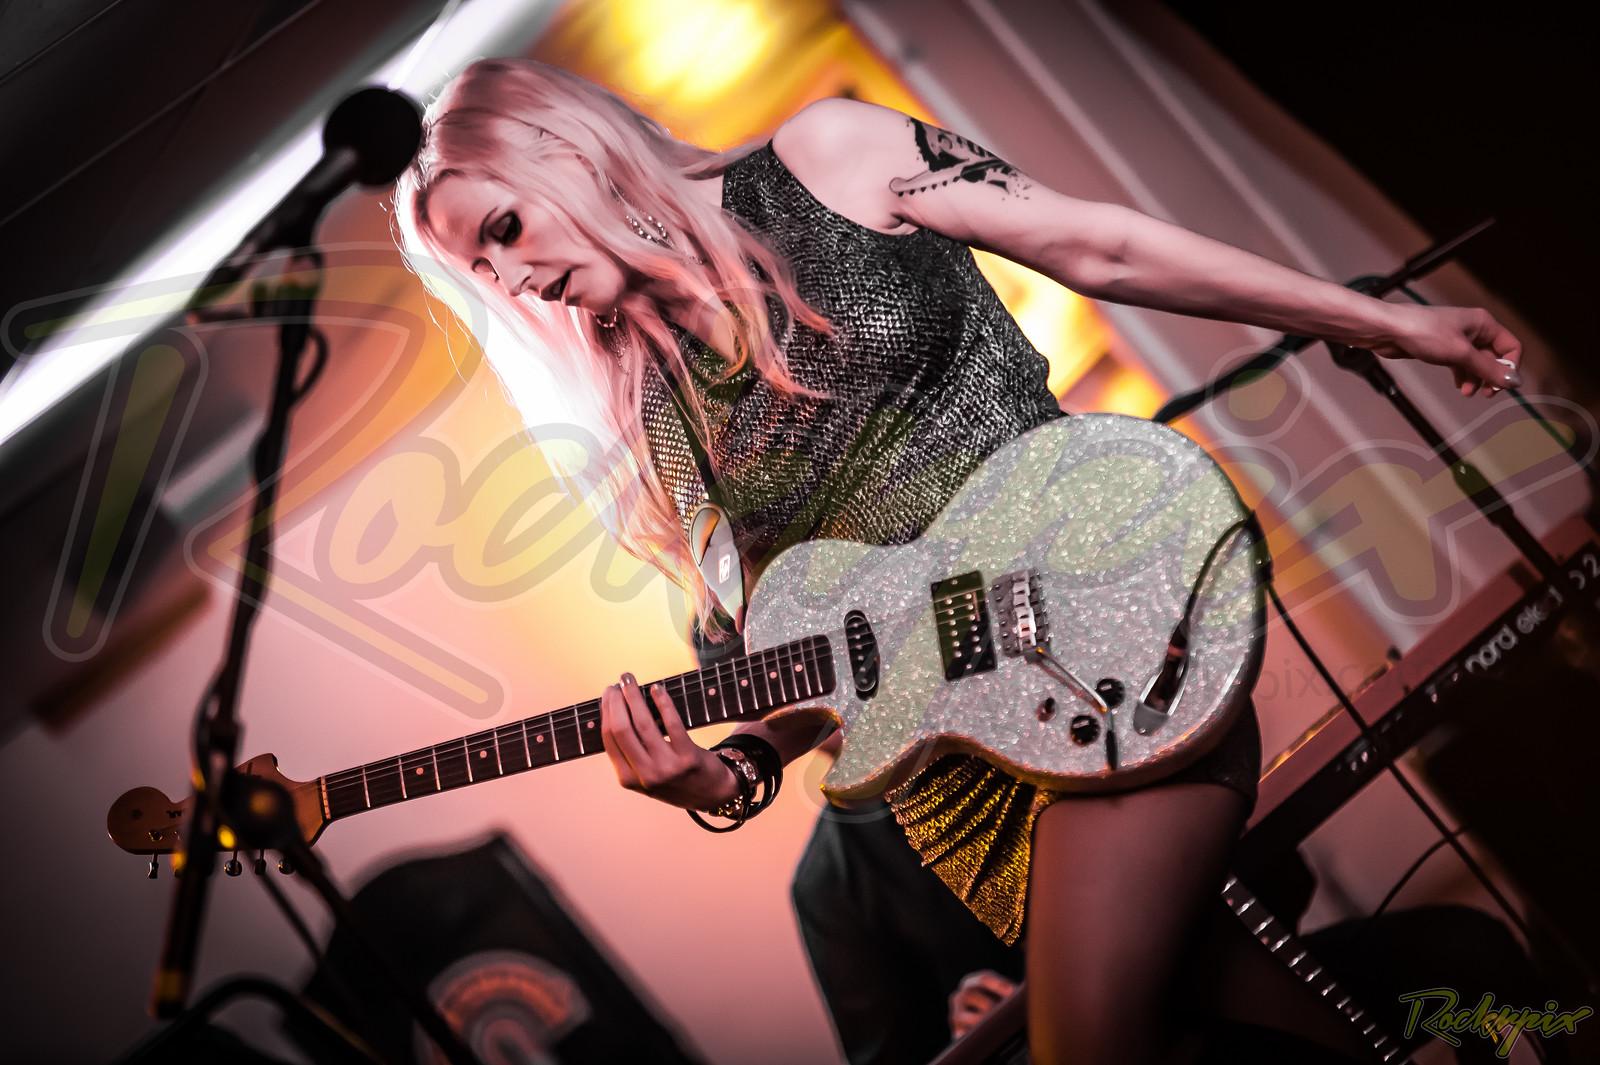 ©Rockrpix - Christina Skjolberg Live at The Boom Boom